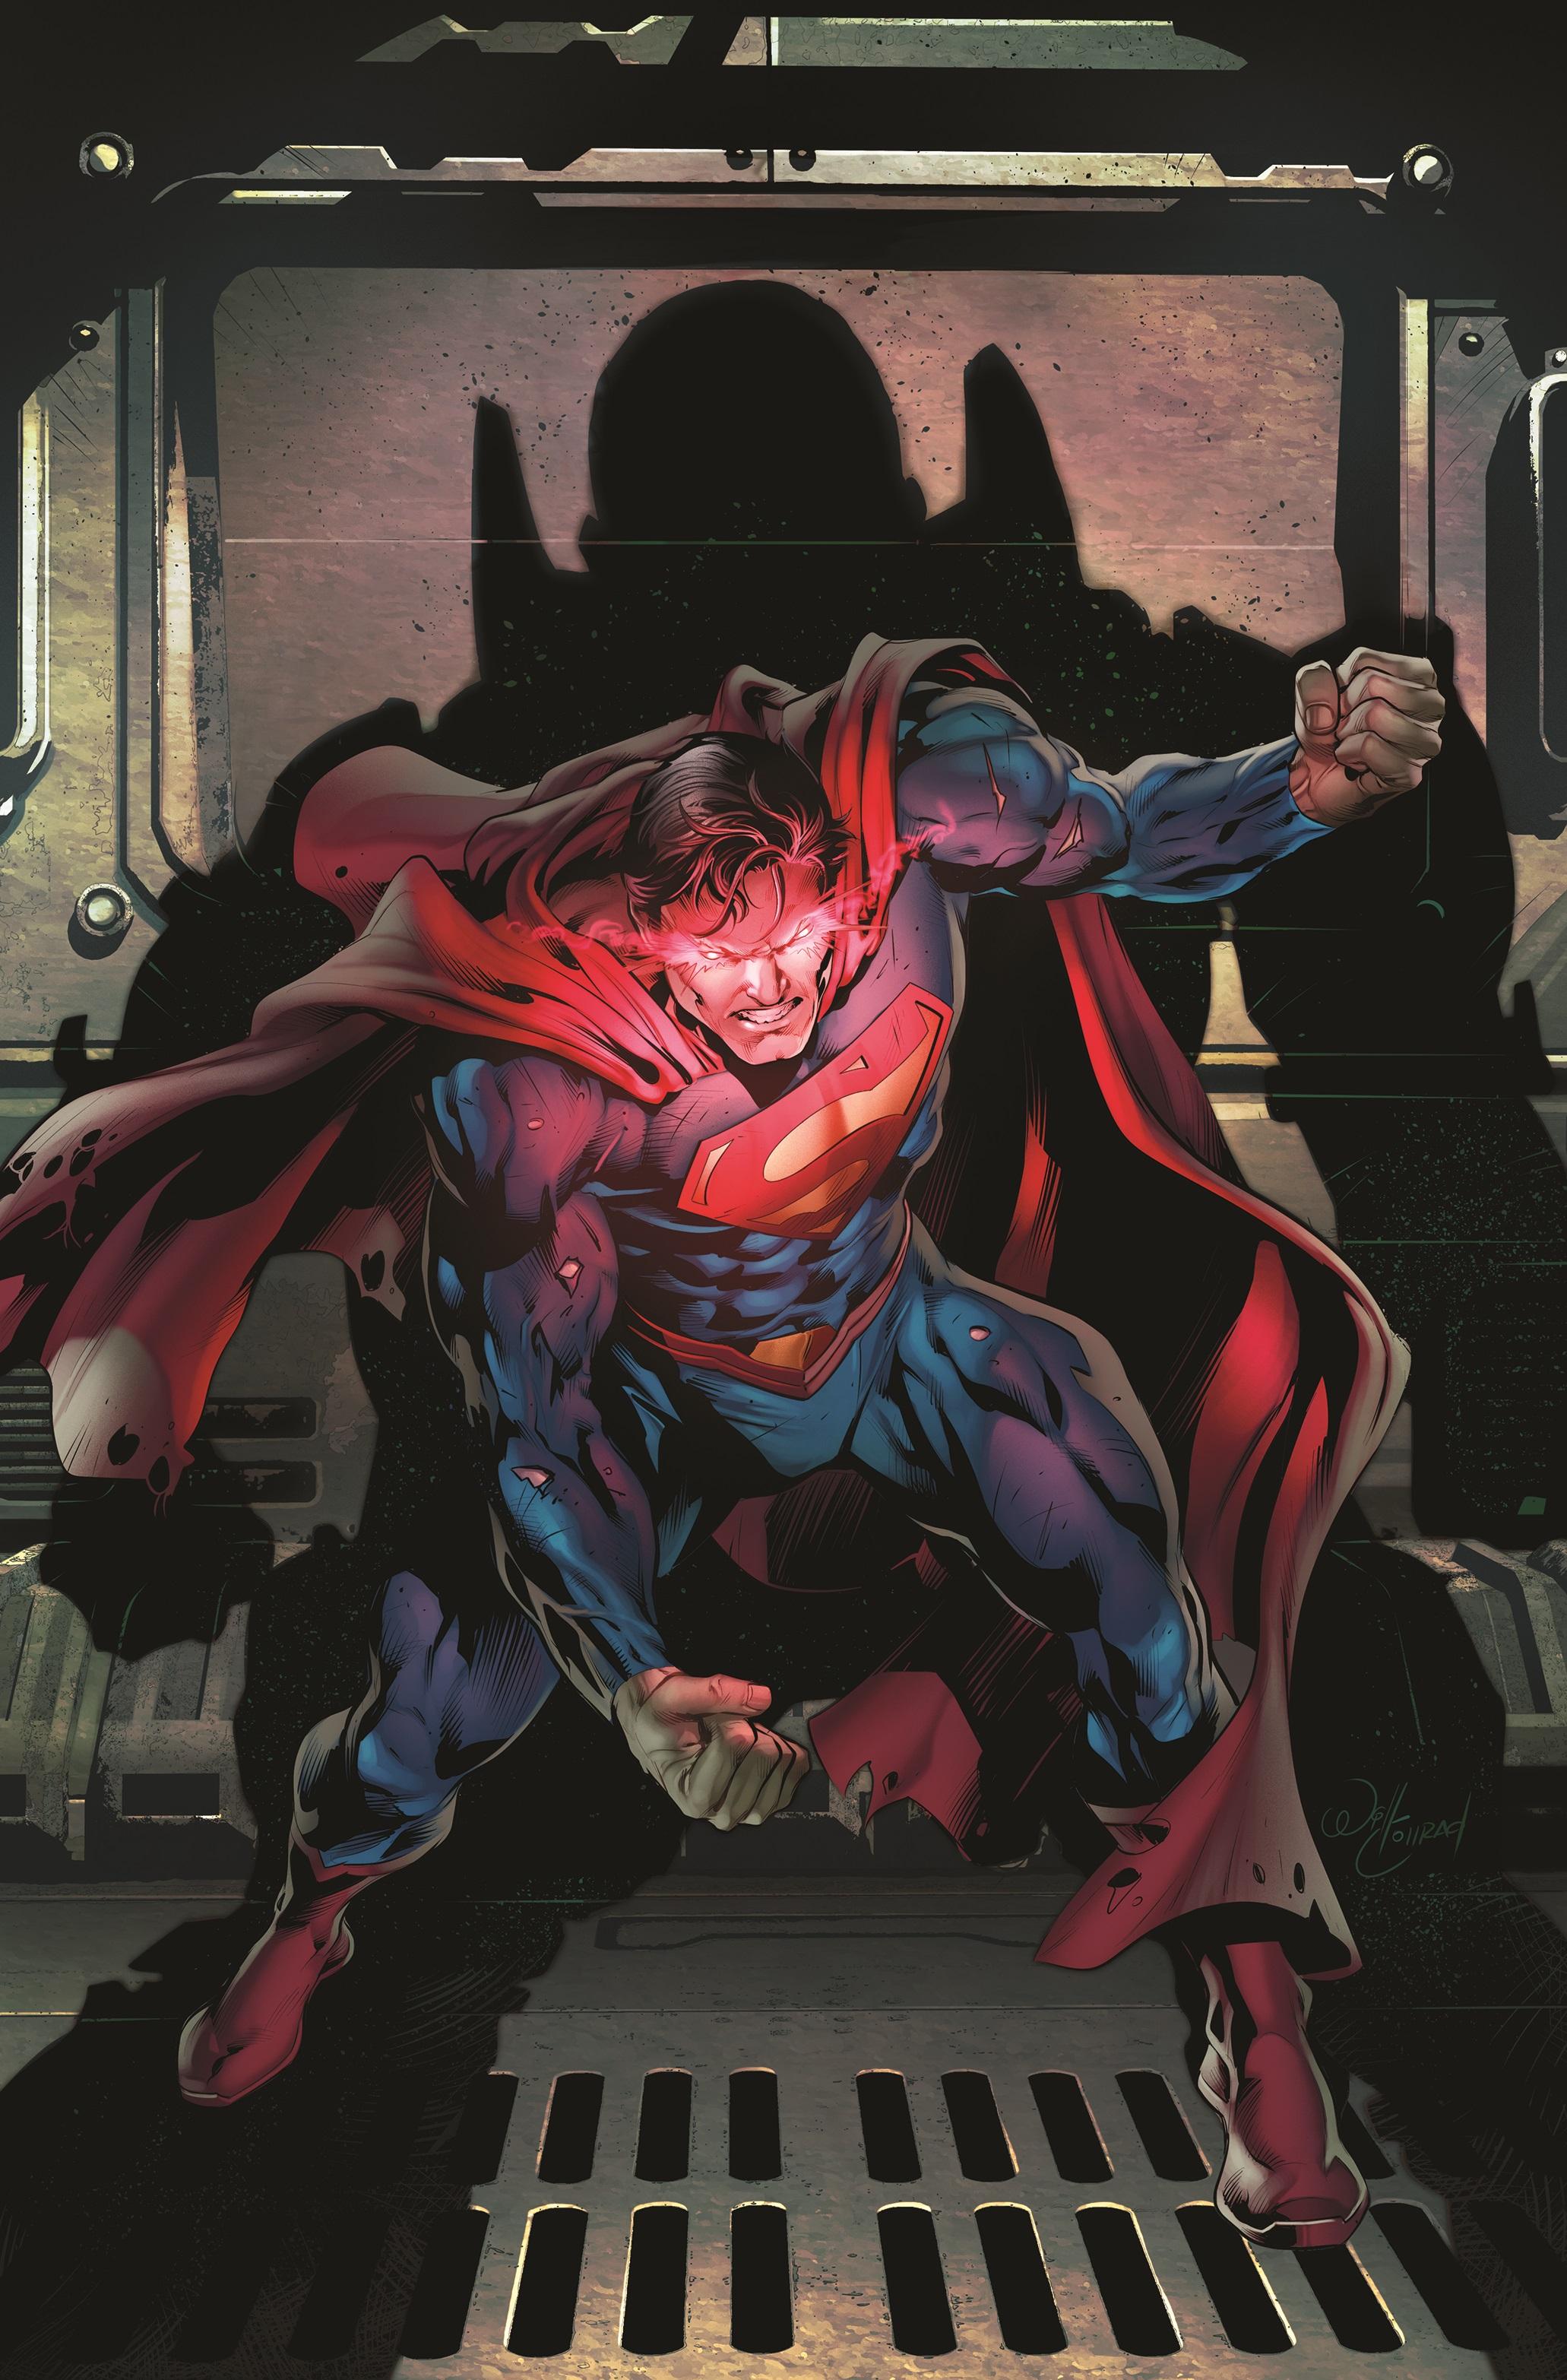 Action Comics Special #1